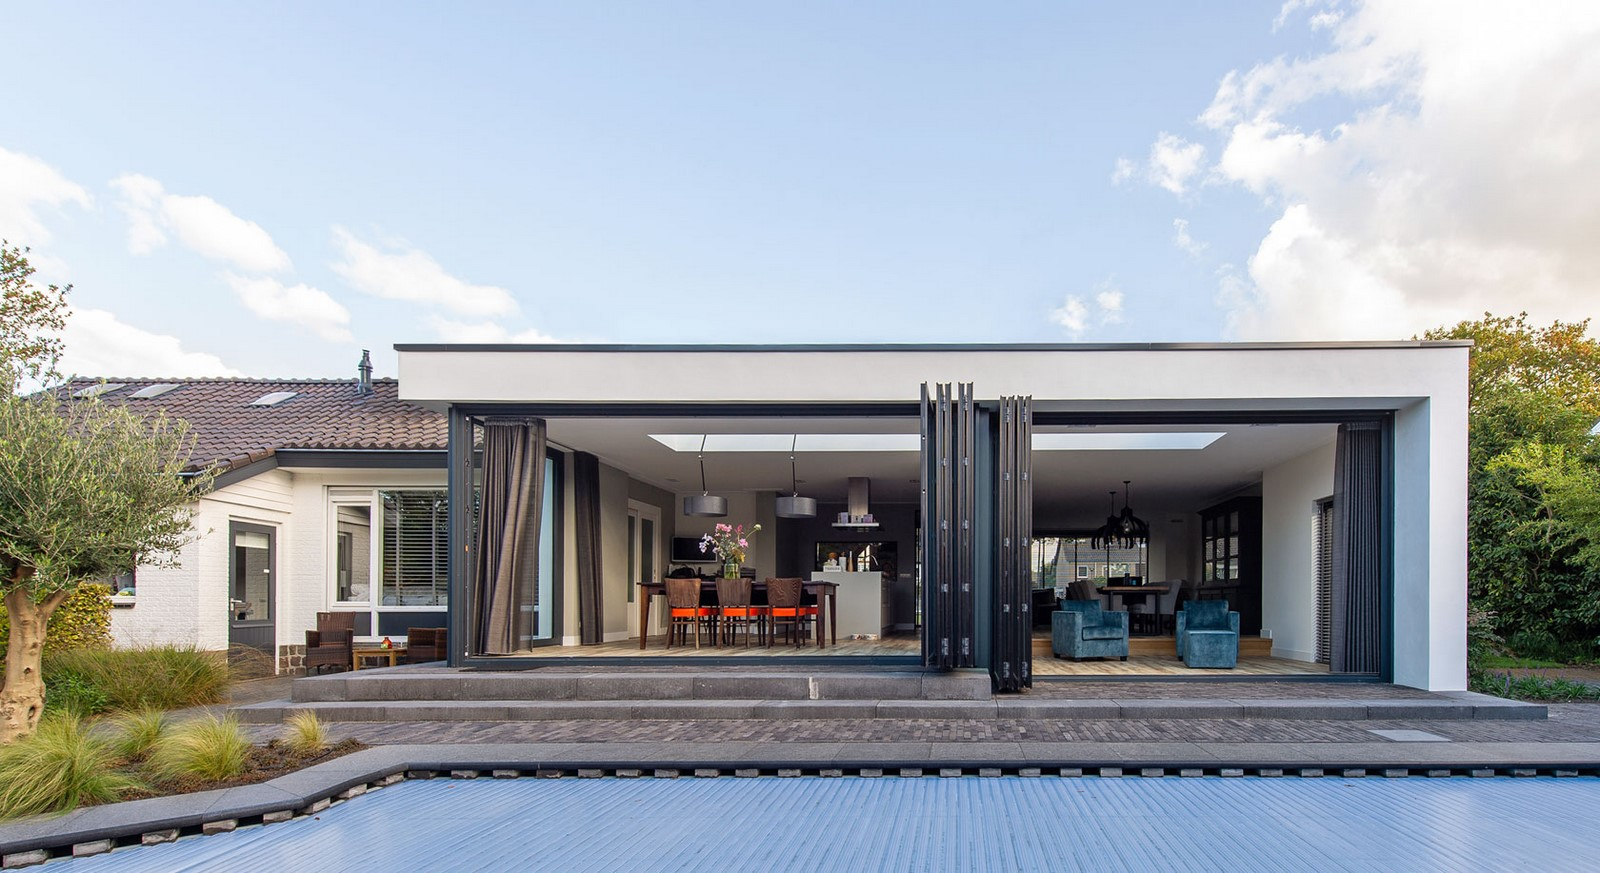 Architects in Breda - Top 55 Architects in Breda - Sheet27